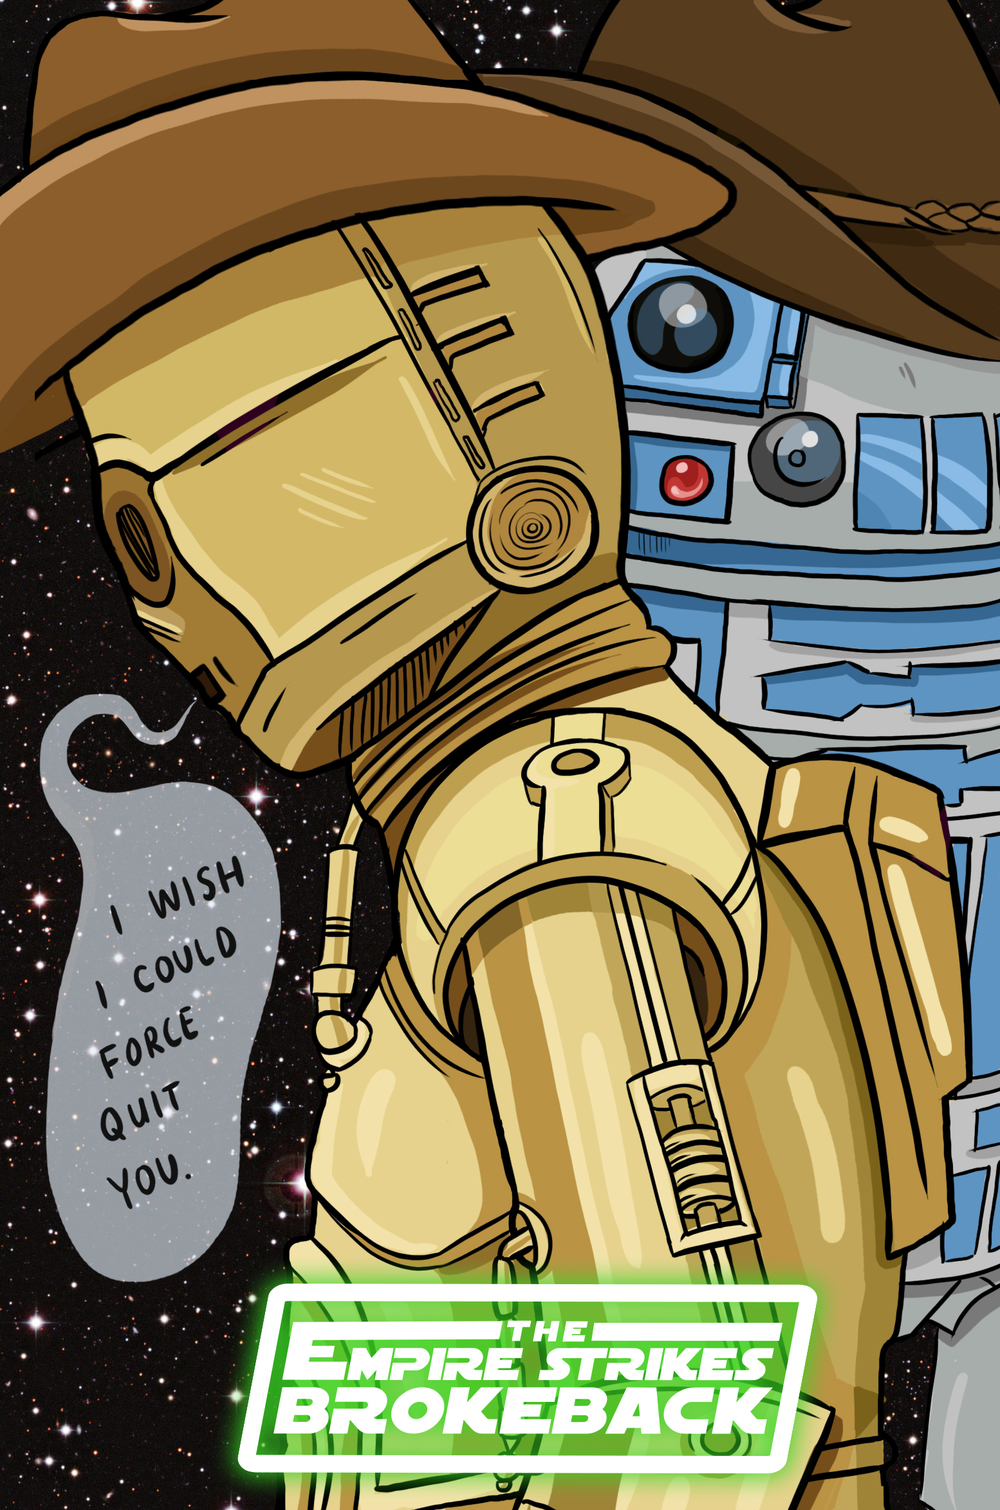 VDAY-ROBOTS.jpg